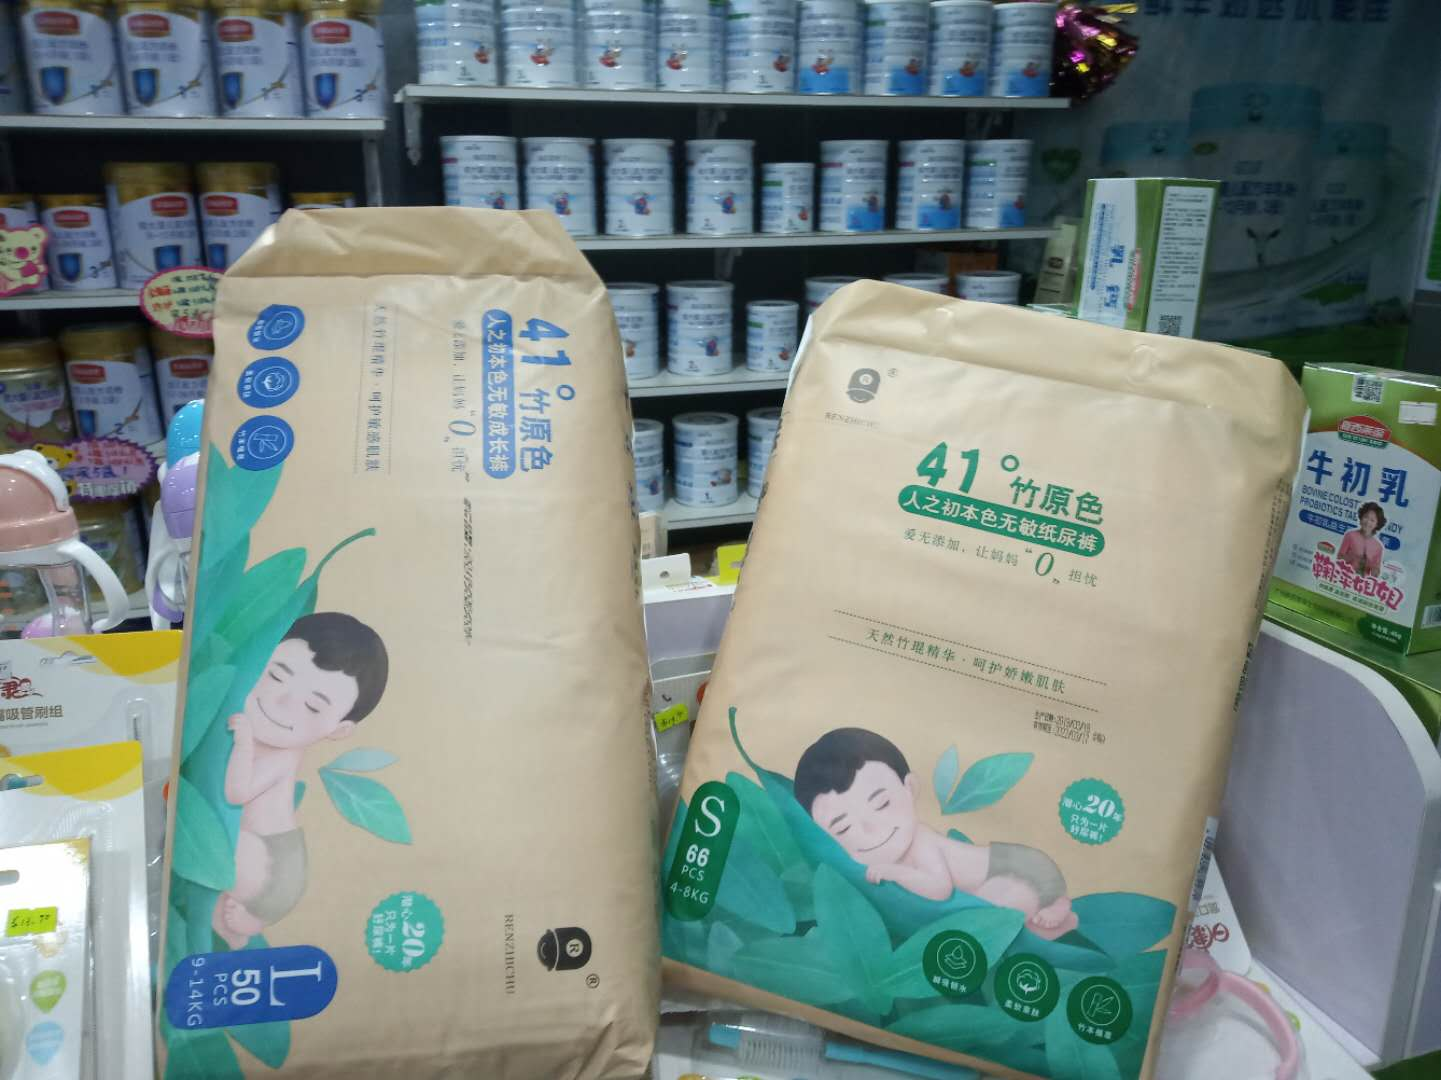 Bamboo primary color diaper s66m56l50xl46 bamboo fiber natural color non sensitive Lala pants